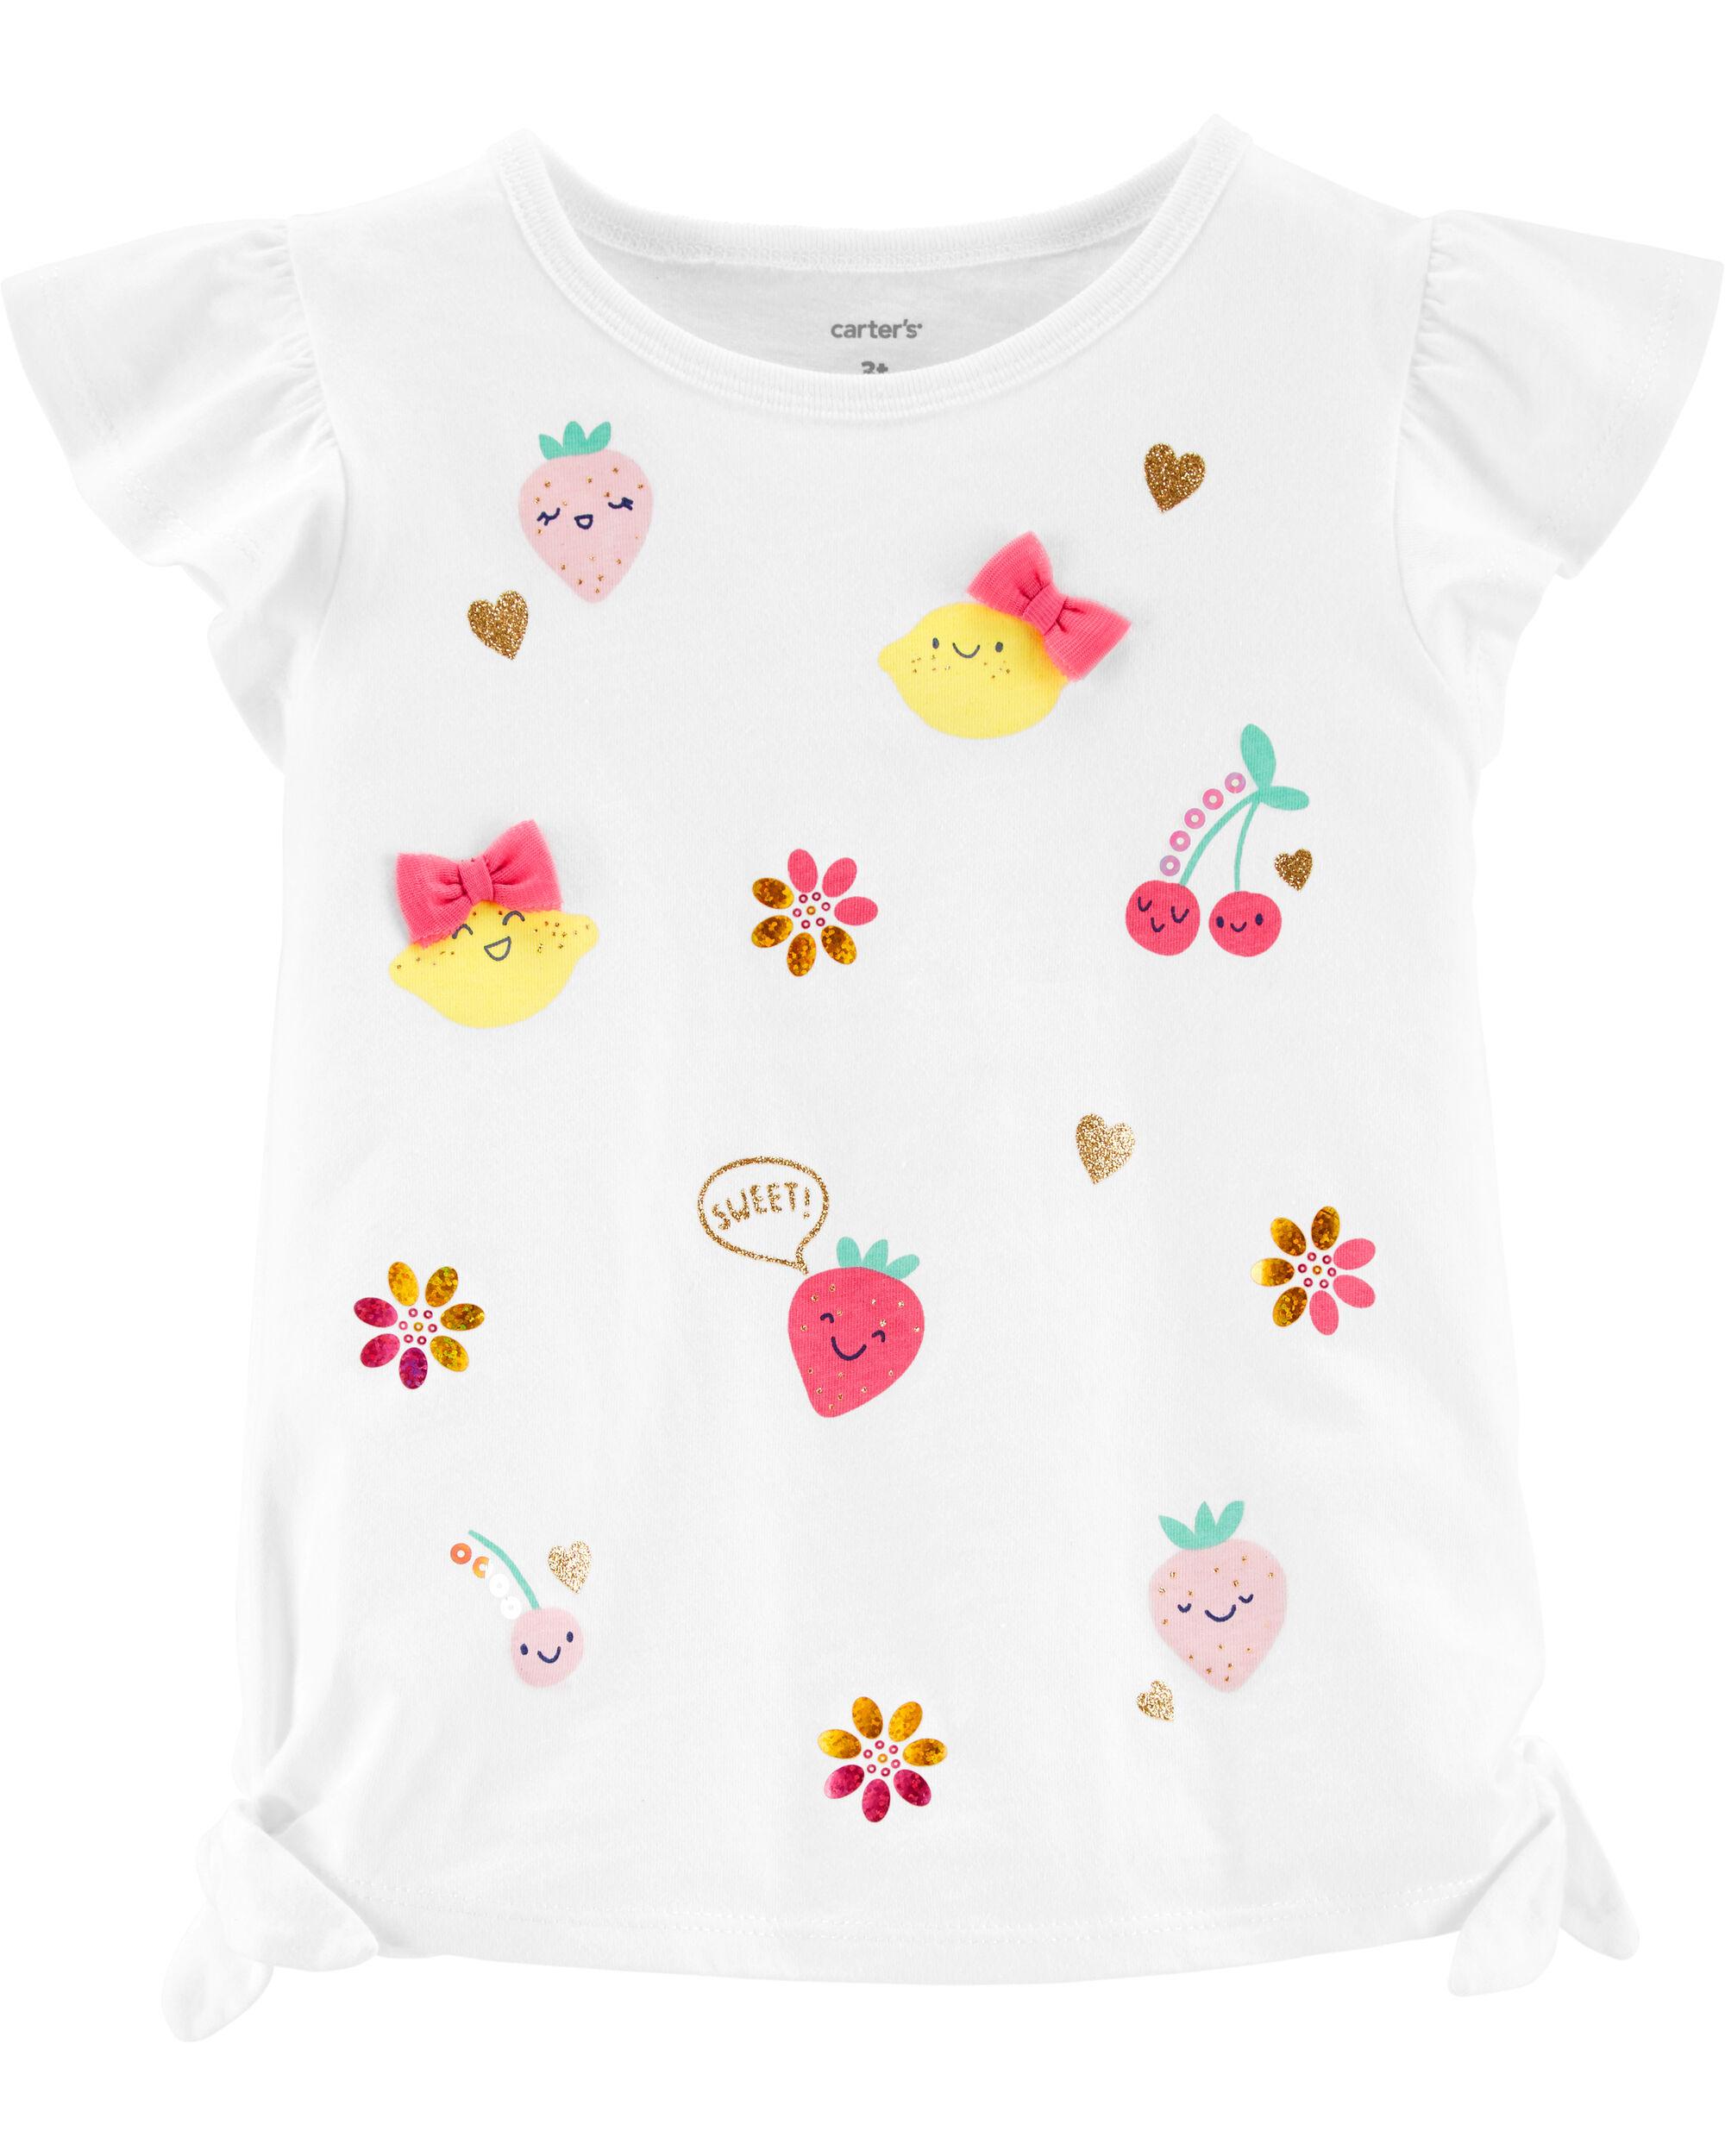 UK/_ BABY BOY GIRL GIRAFFE PRINT CREW NECK LONG SLEEVE T-SHIRT BOTTOMING TOP CLAS